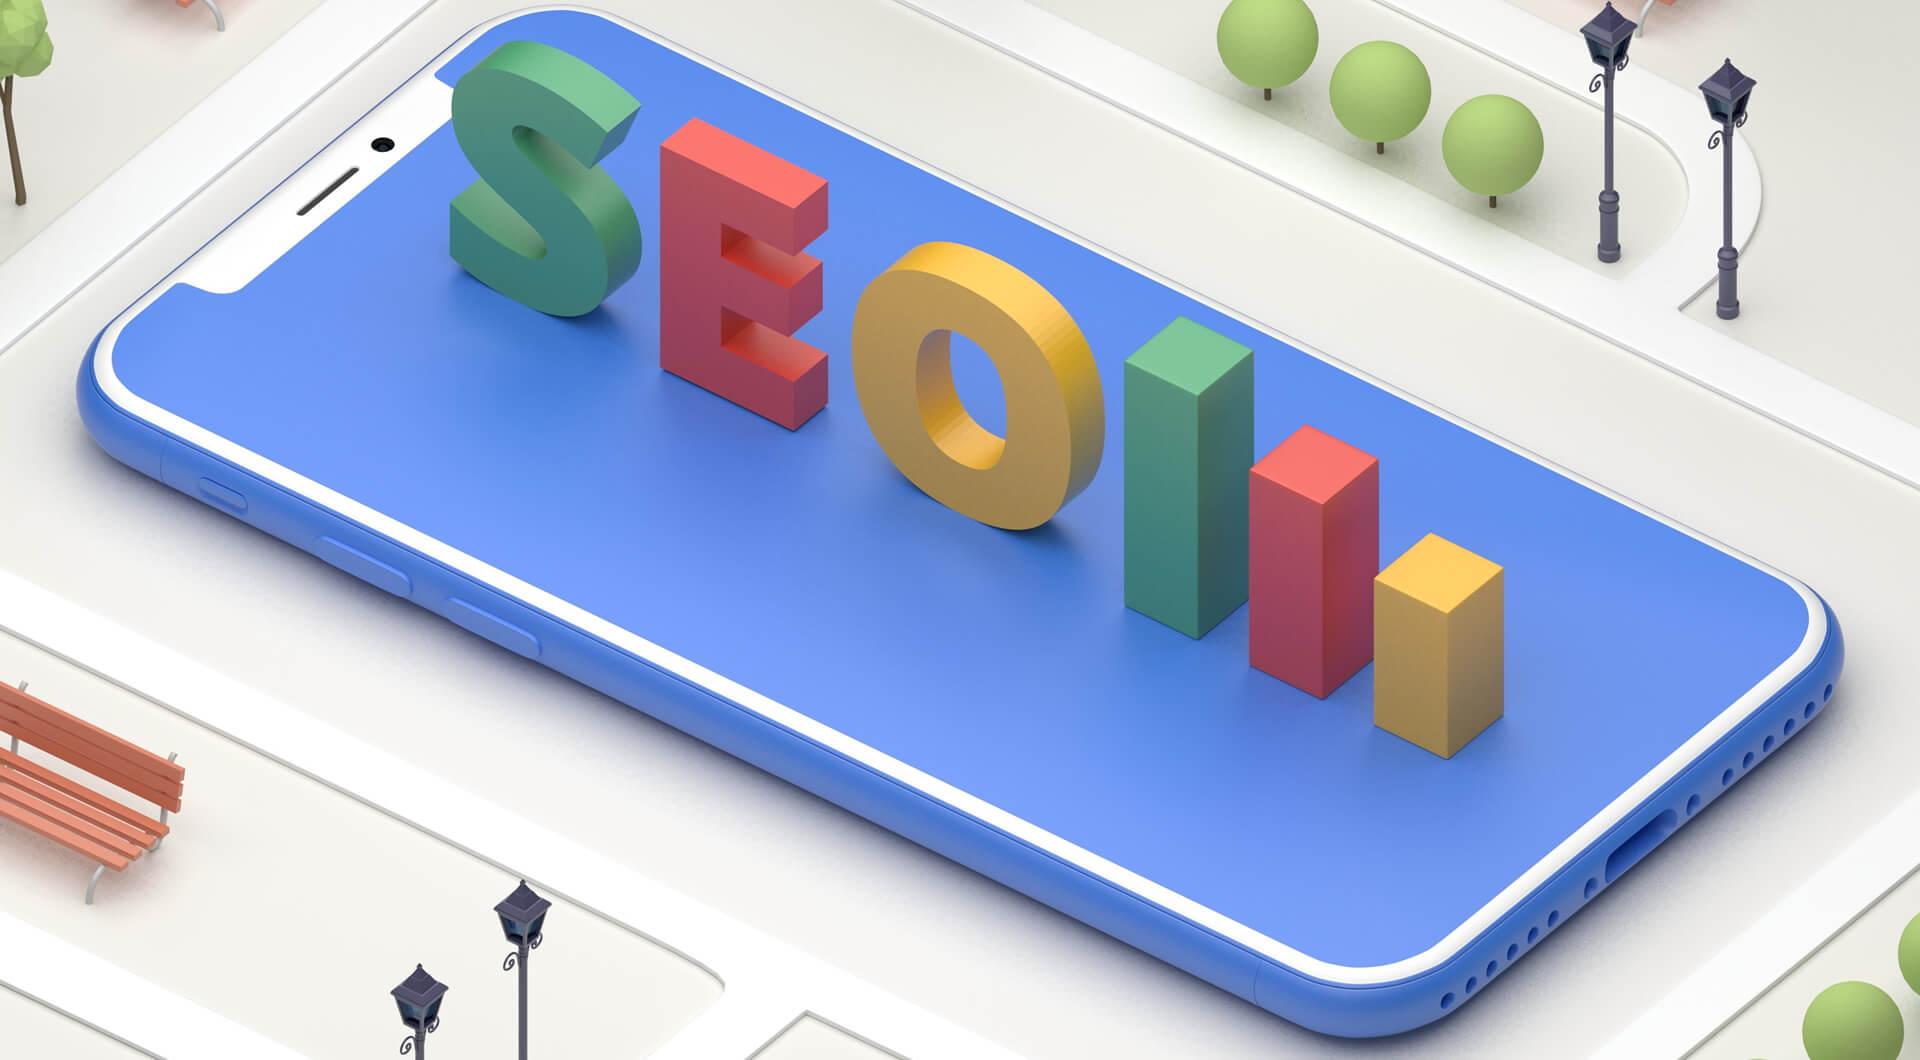 SEO Experts, Digital Marketing in Kenya - Search Engine Optimization